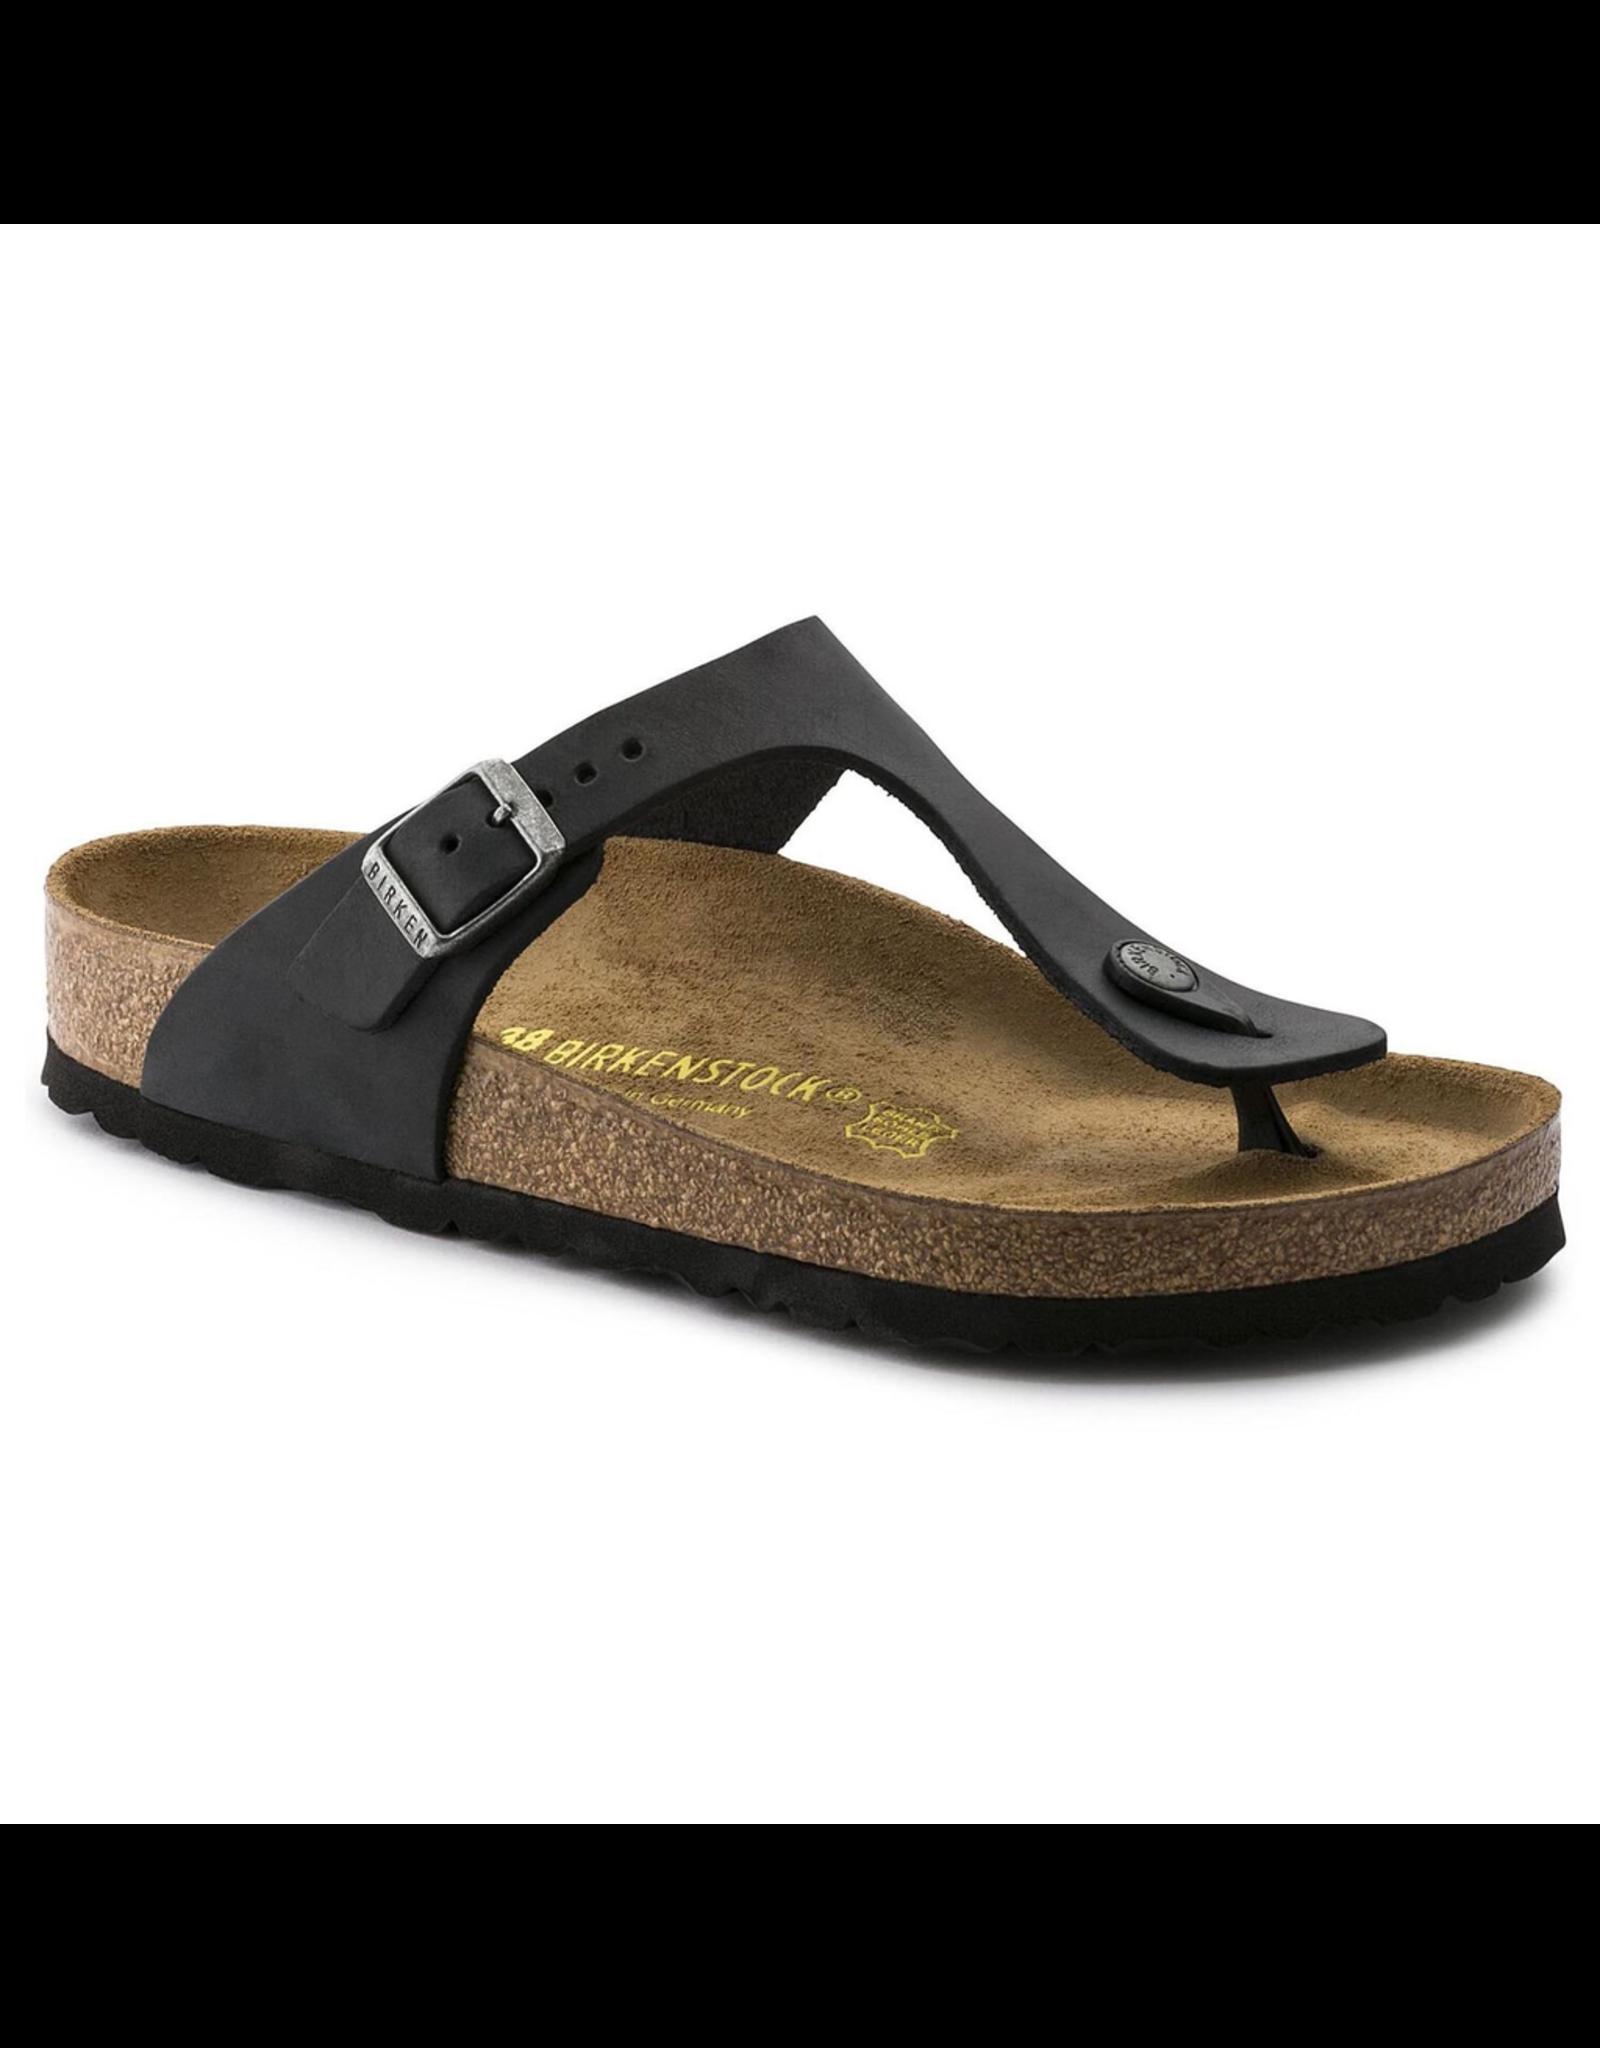 Birkenstock Gizeh Leather Sandal - COV11776